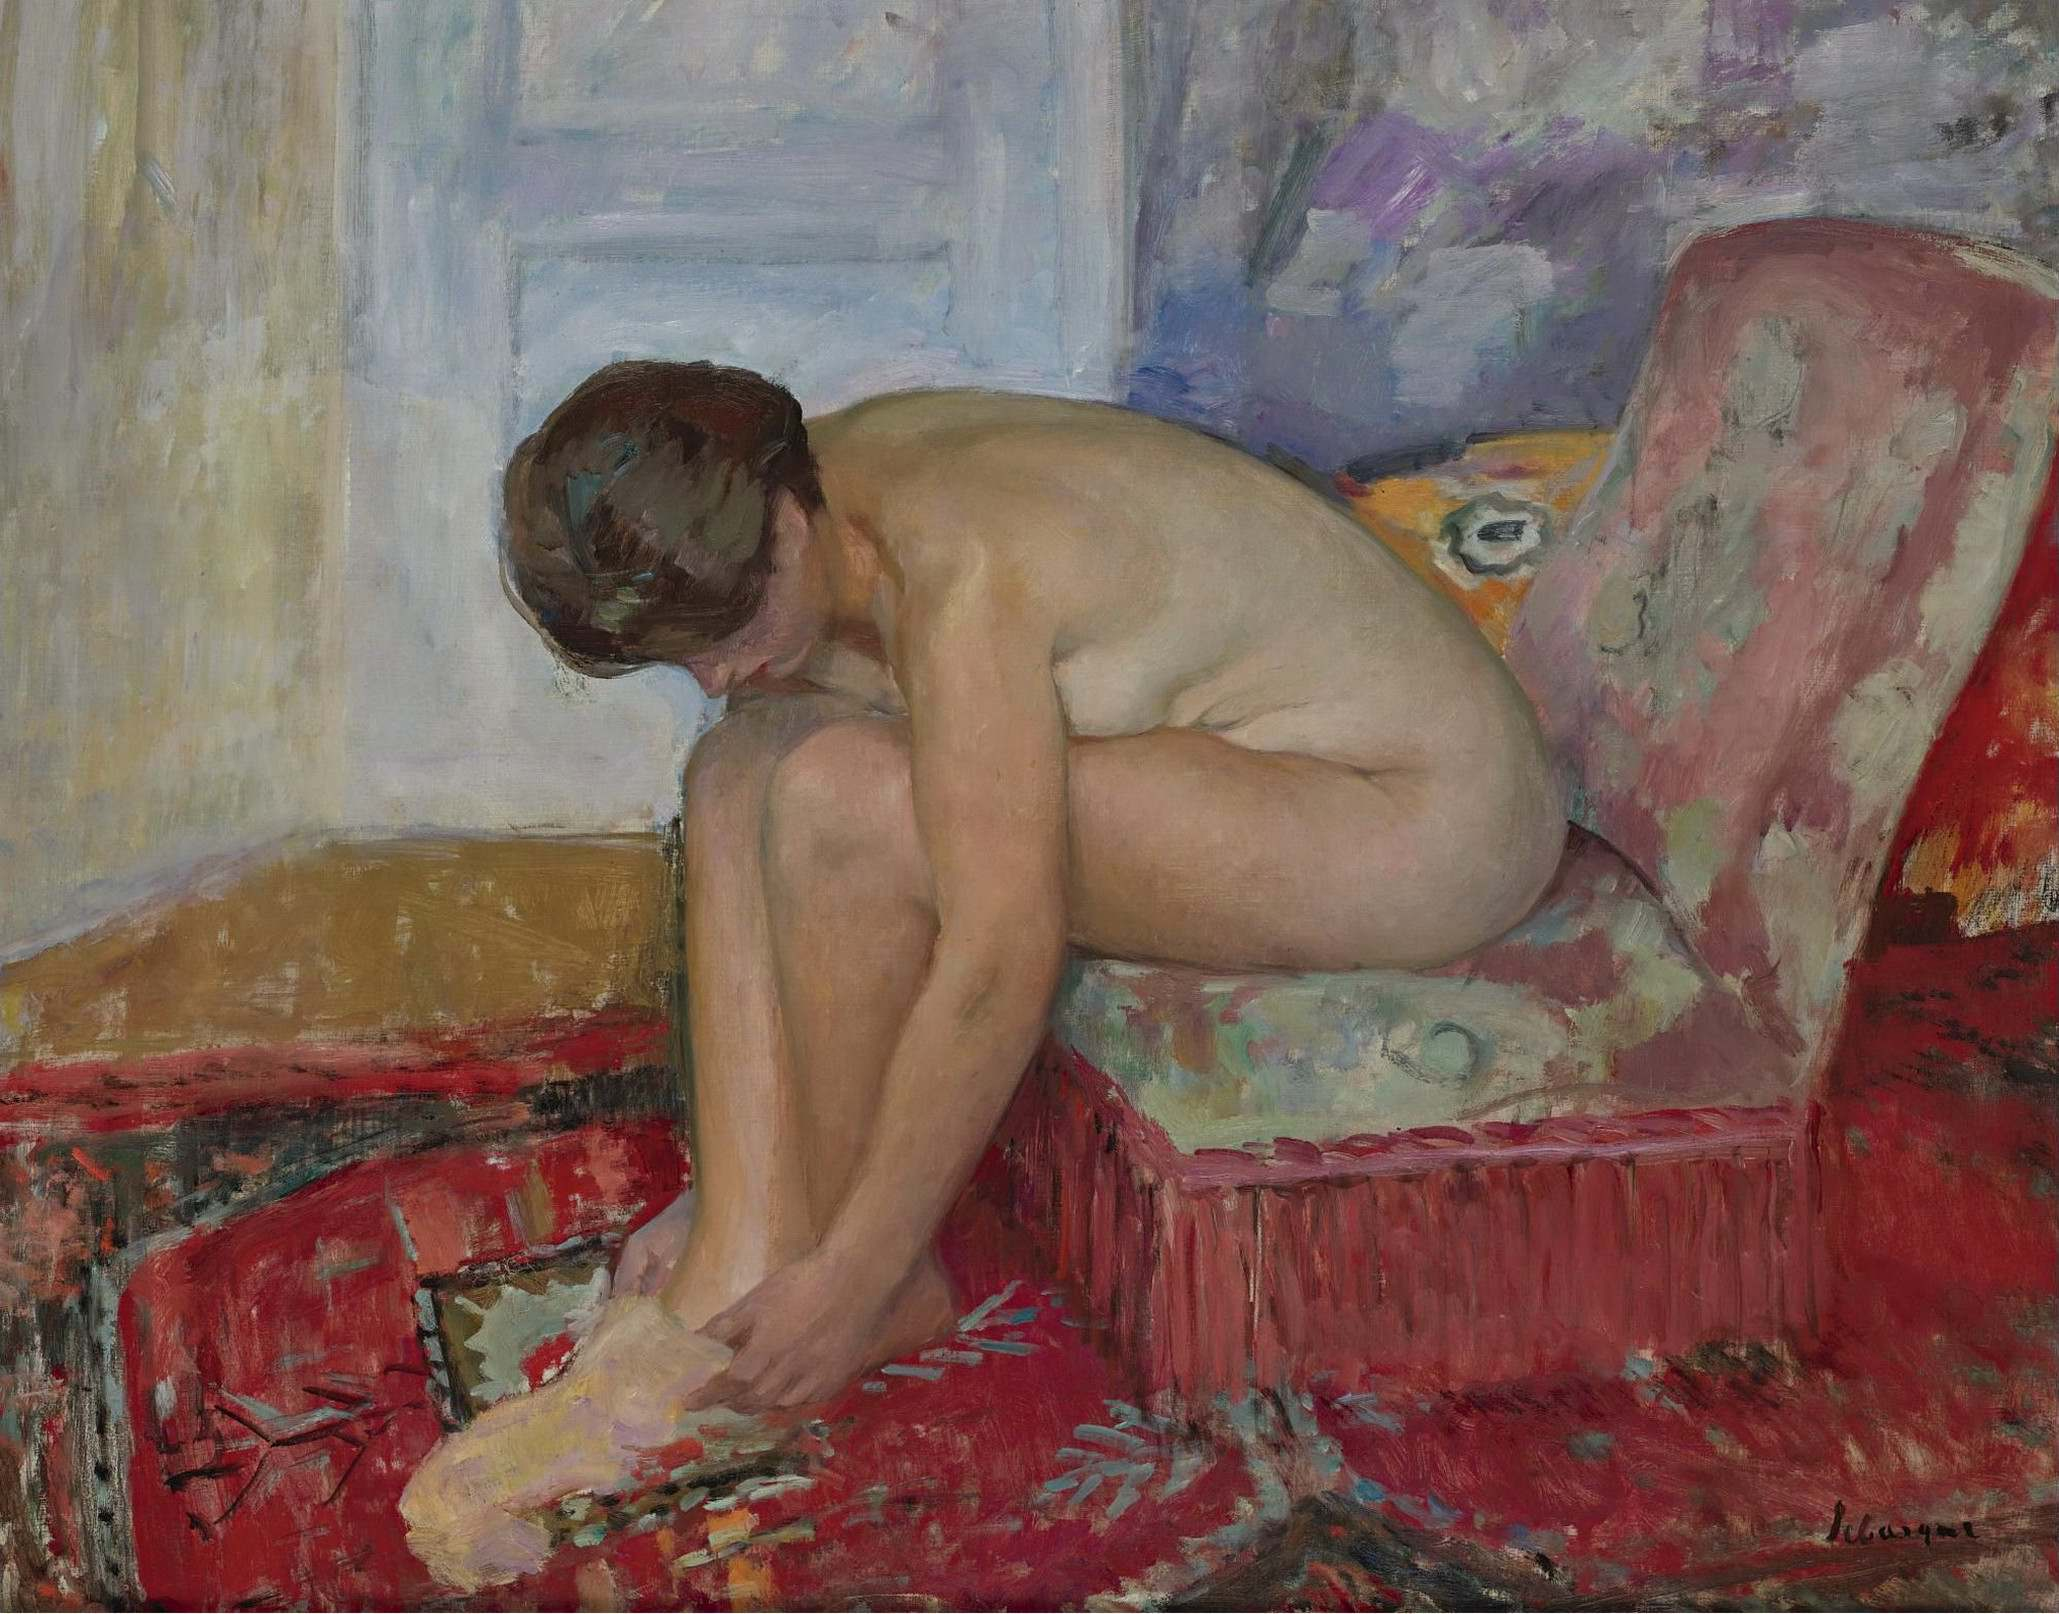 Henri Lebasque, 1865-1937. Сидящая обнаженная-1. Частная коллекция